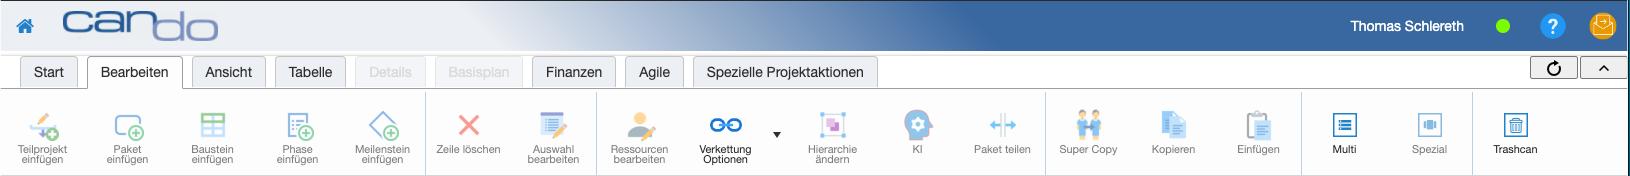 Navigation enthält alle Icons, Browser ist breit genug |  | Can Do Software